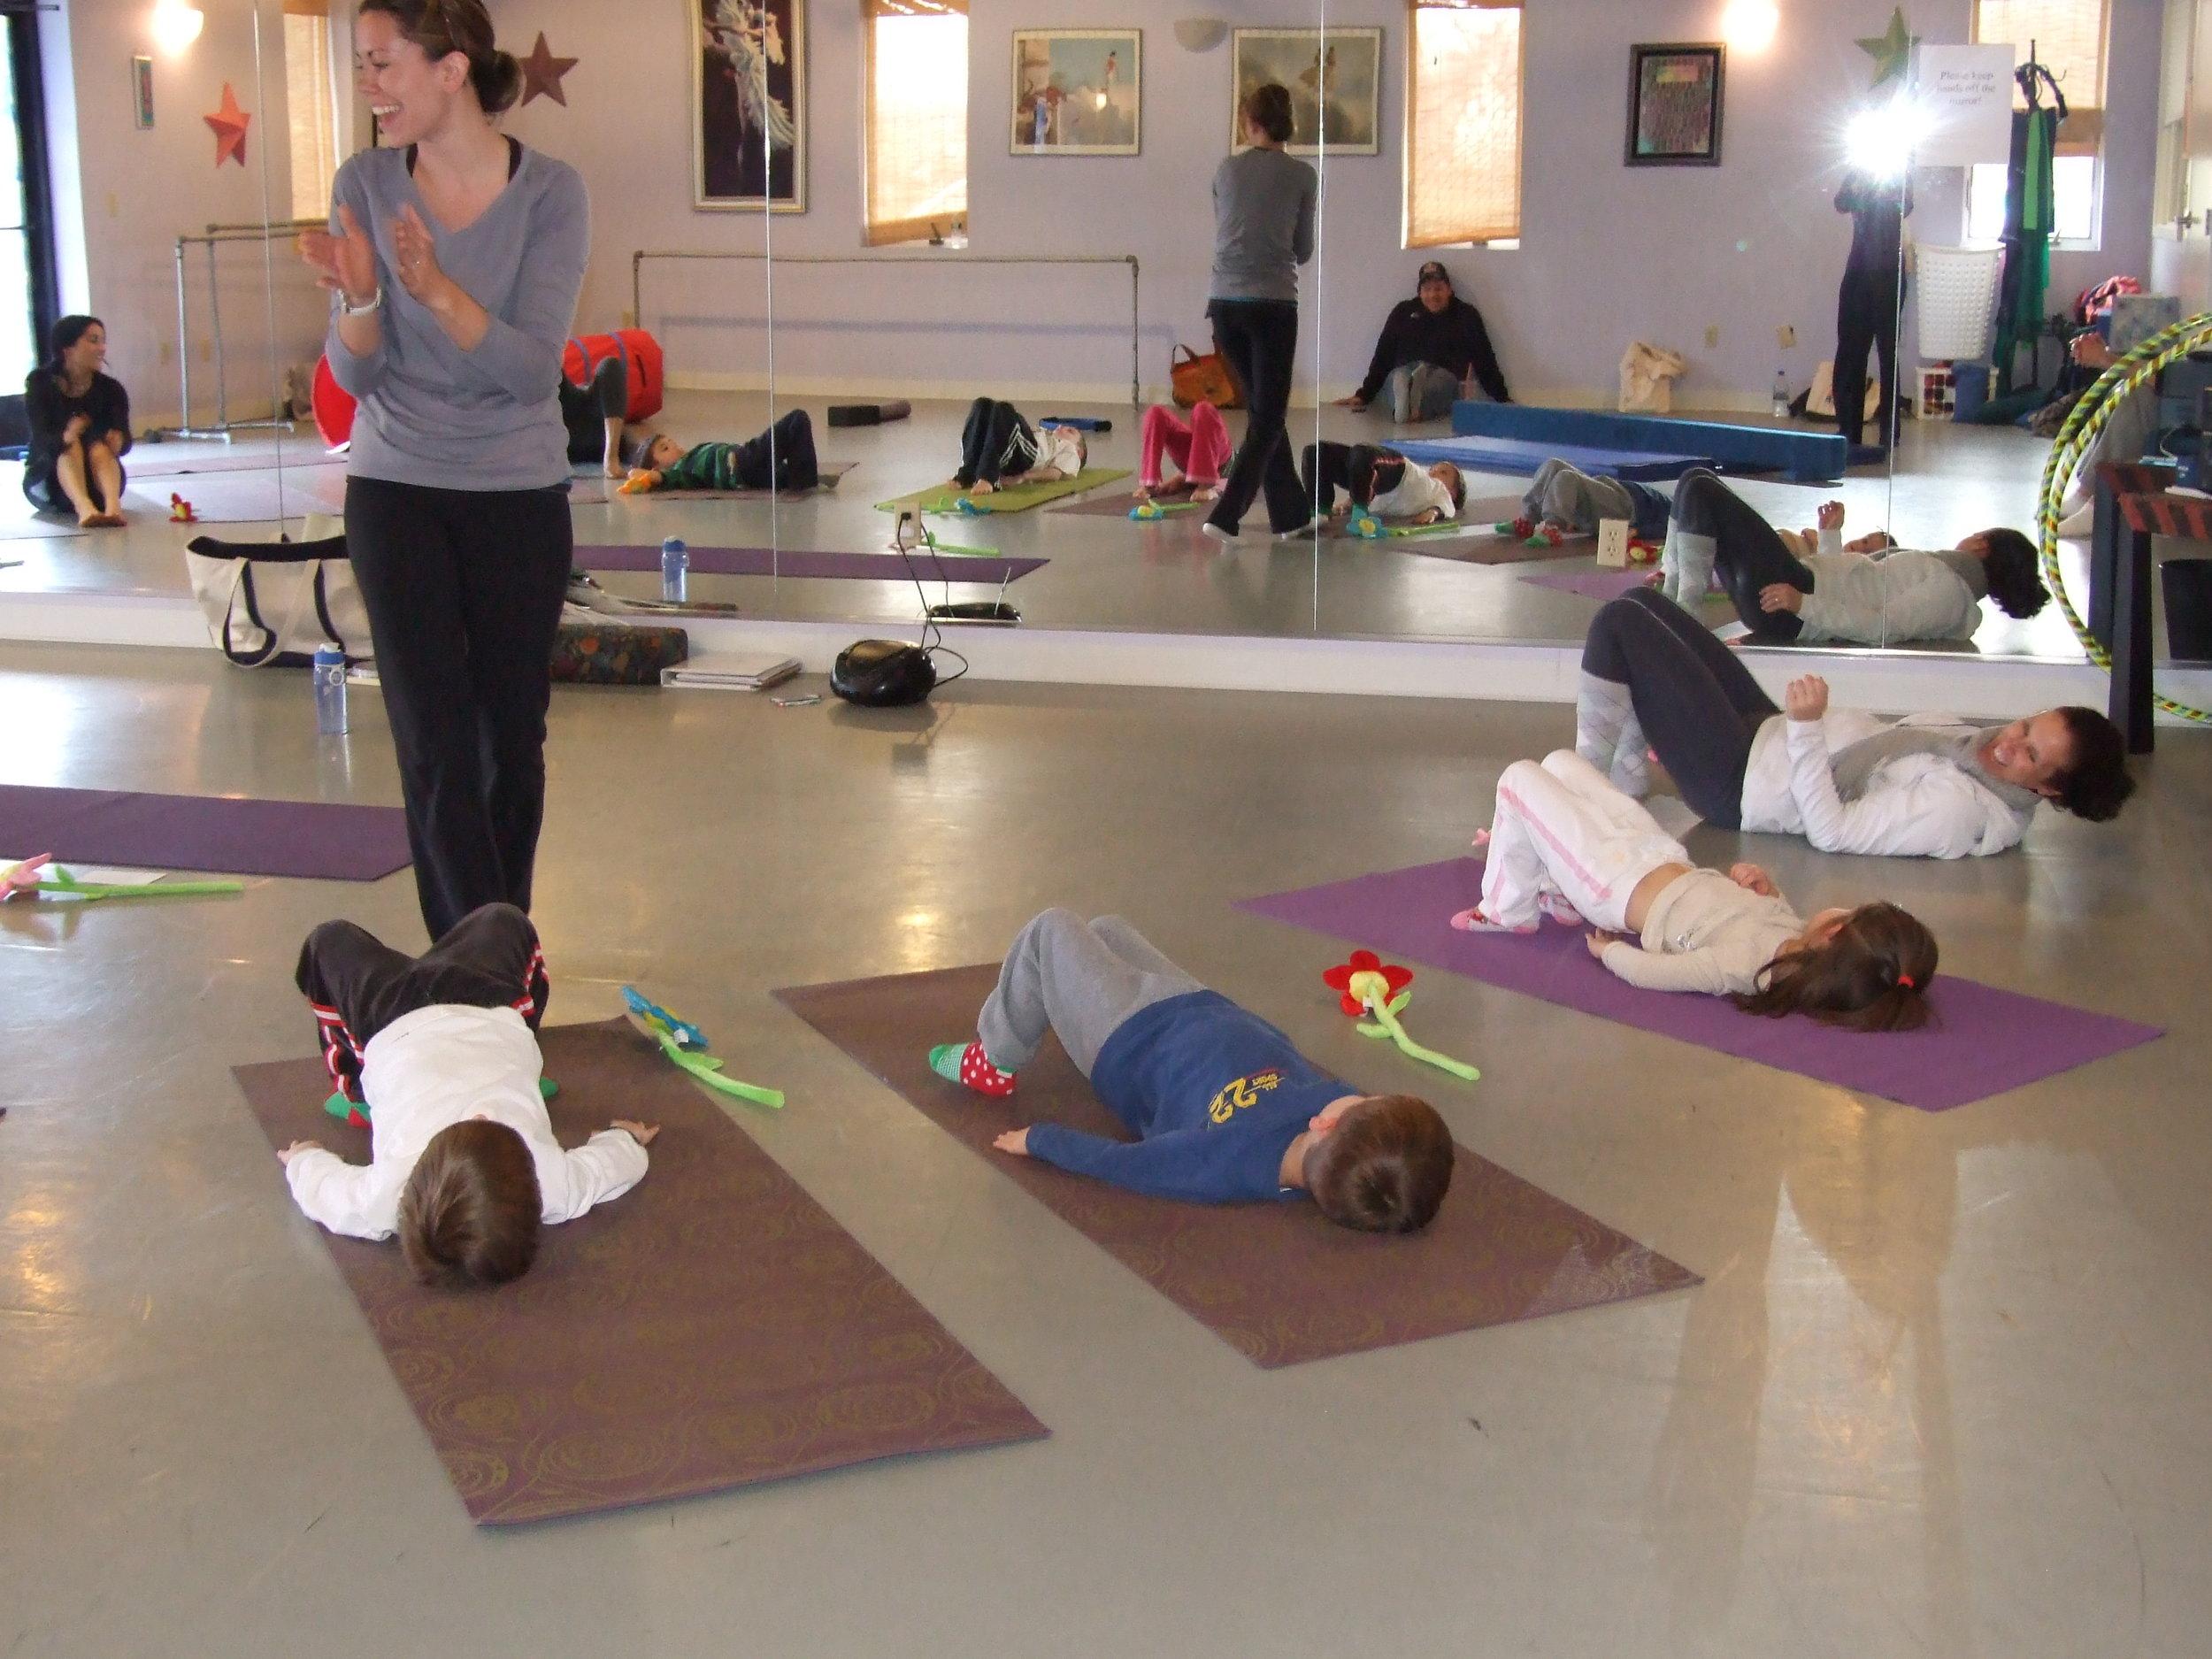 all photos taken during Lotus Gardens Yoga Teacher Training